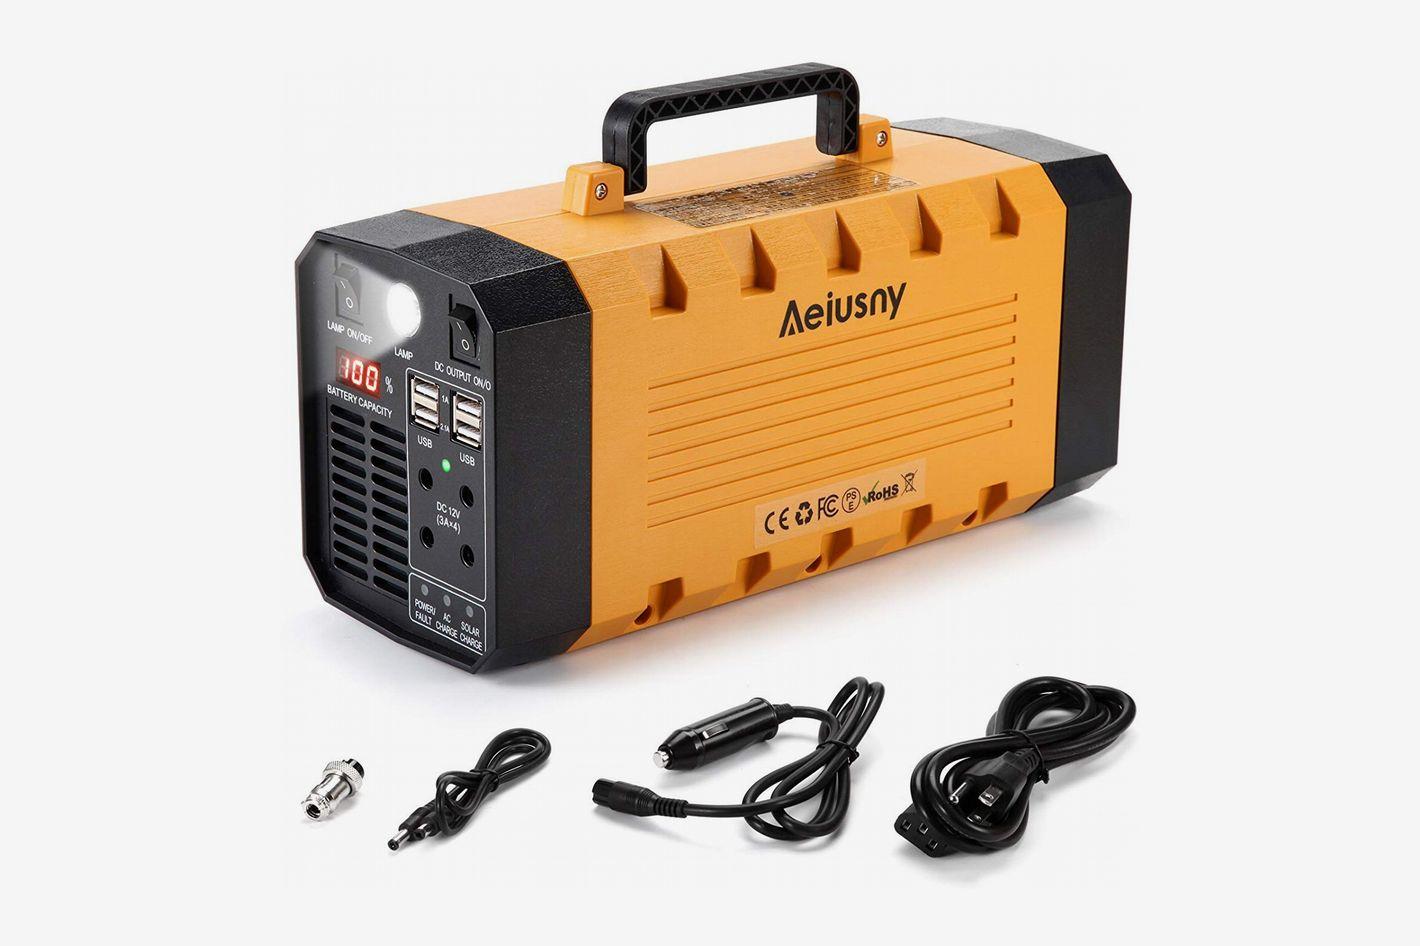 Aeiusny Solar Portable Generator, 288Wh